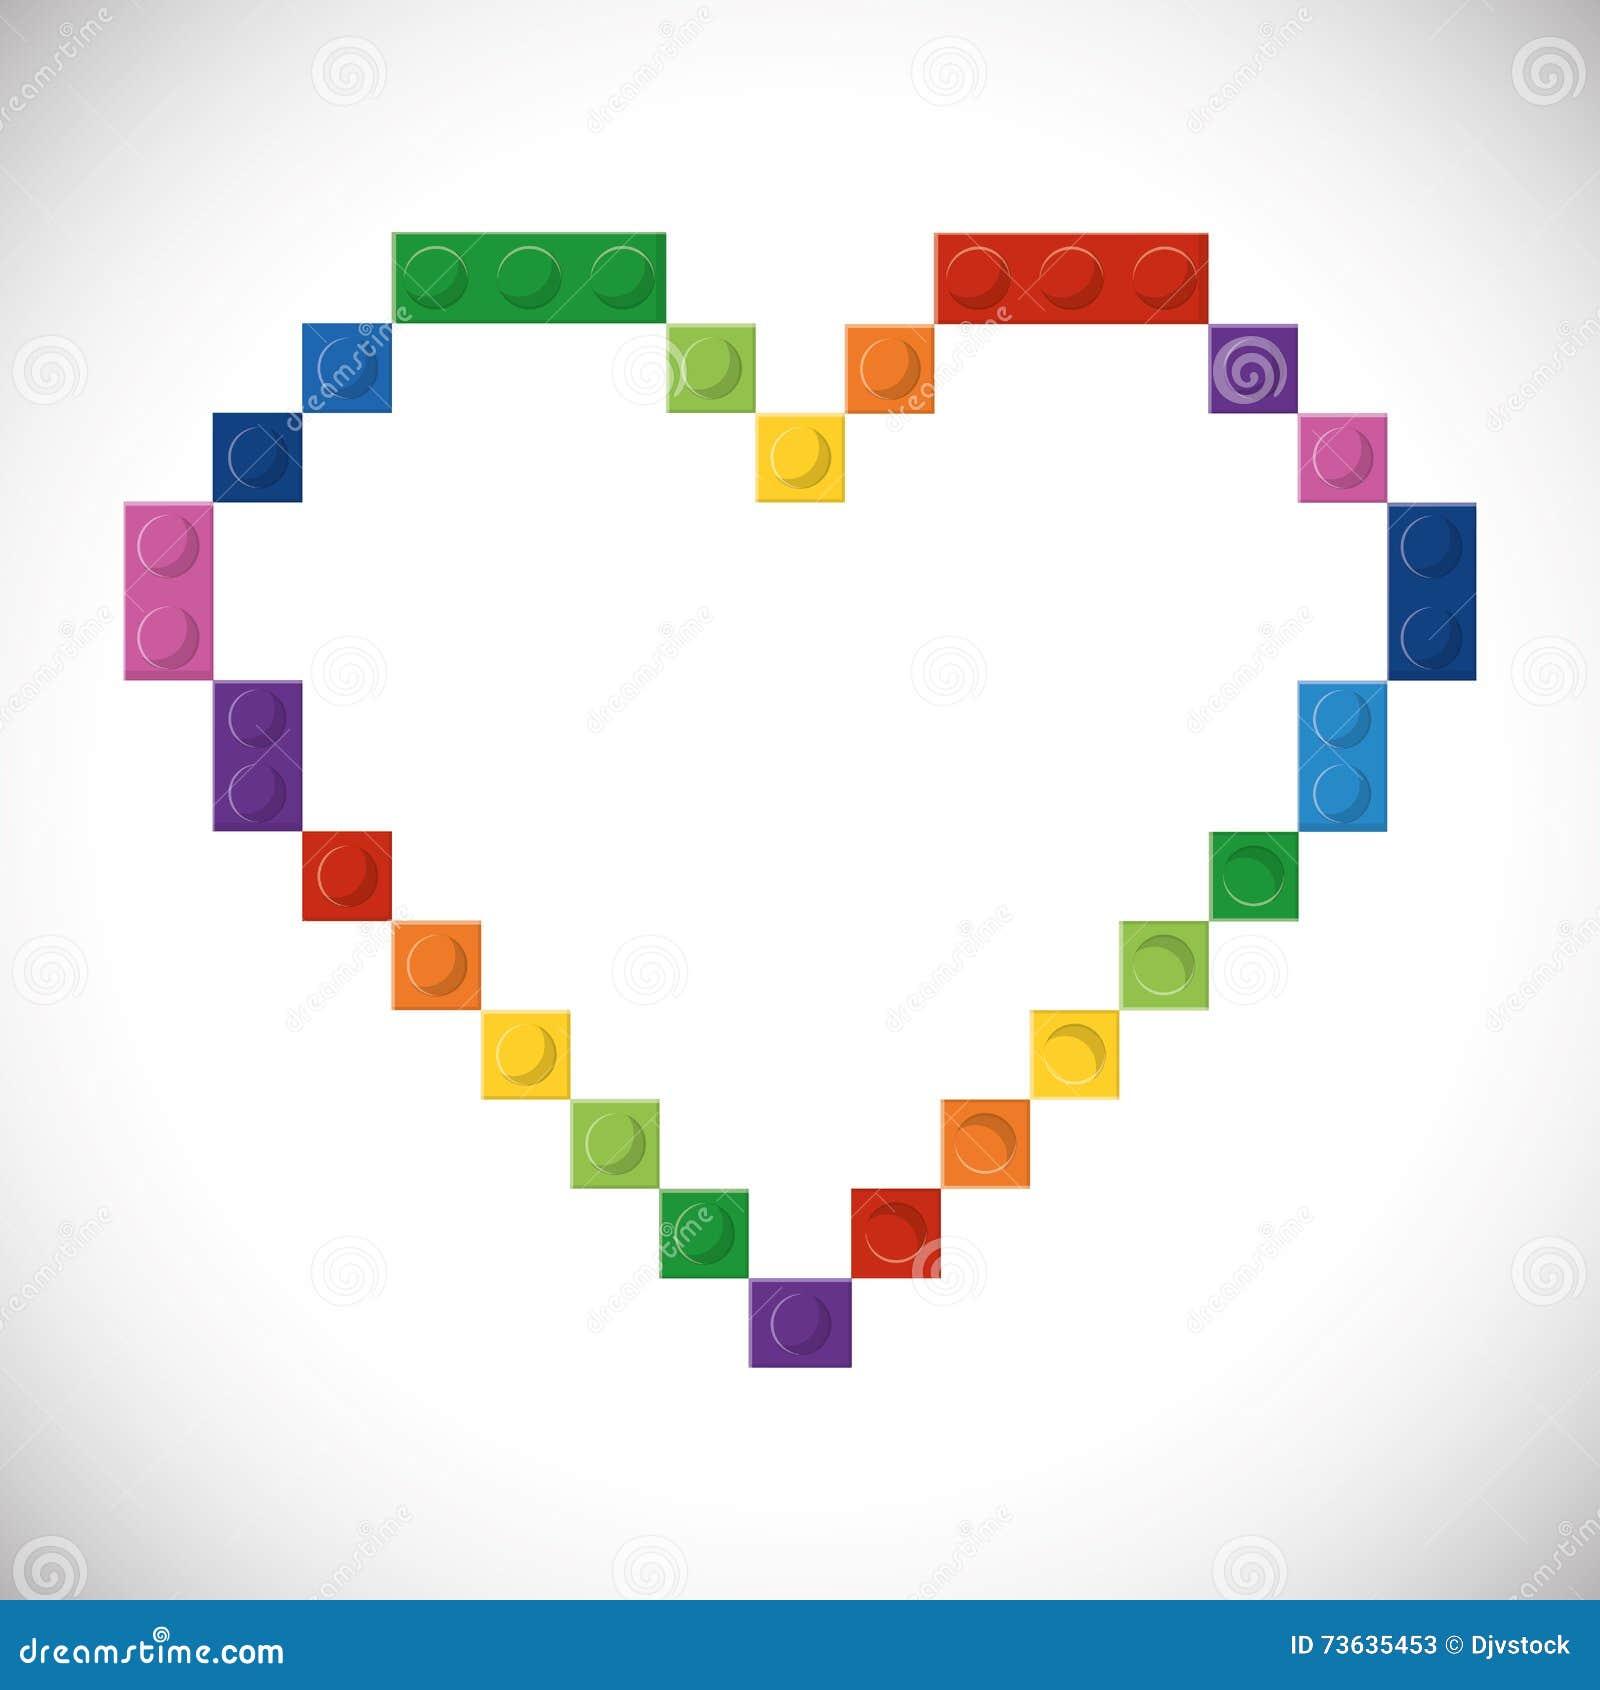 Lego heart stock illustrations 22 lego heart stock illustrations lego heart stock illustrations 22 lego heart stock illustrations vectors clipart dreamstime stopboris Gallery